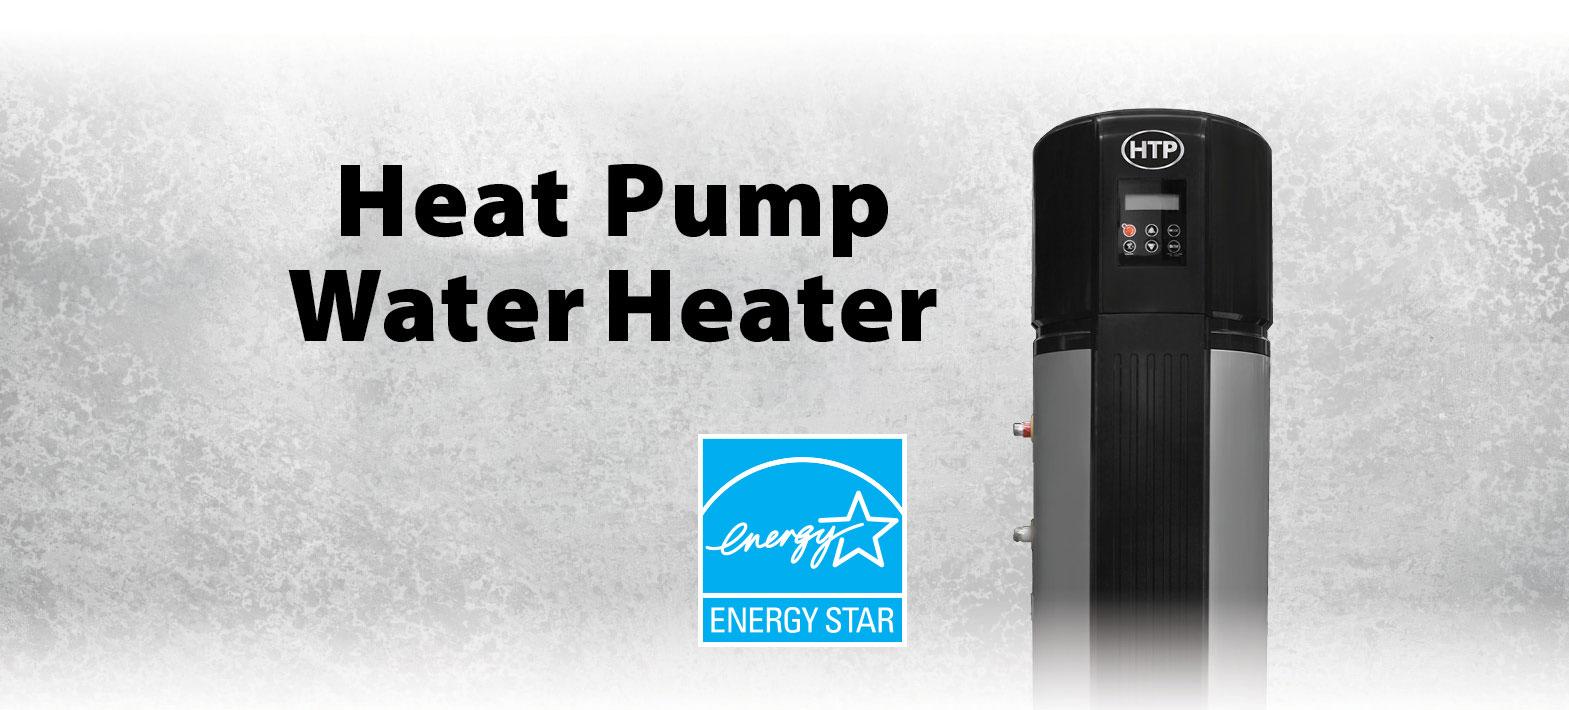 the heat pump water heater